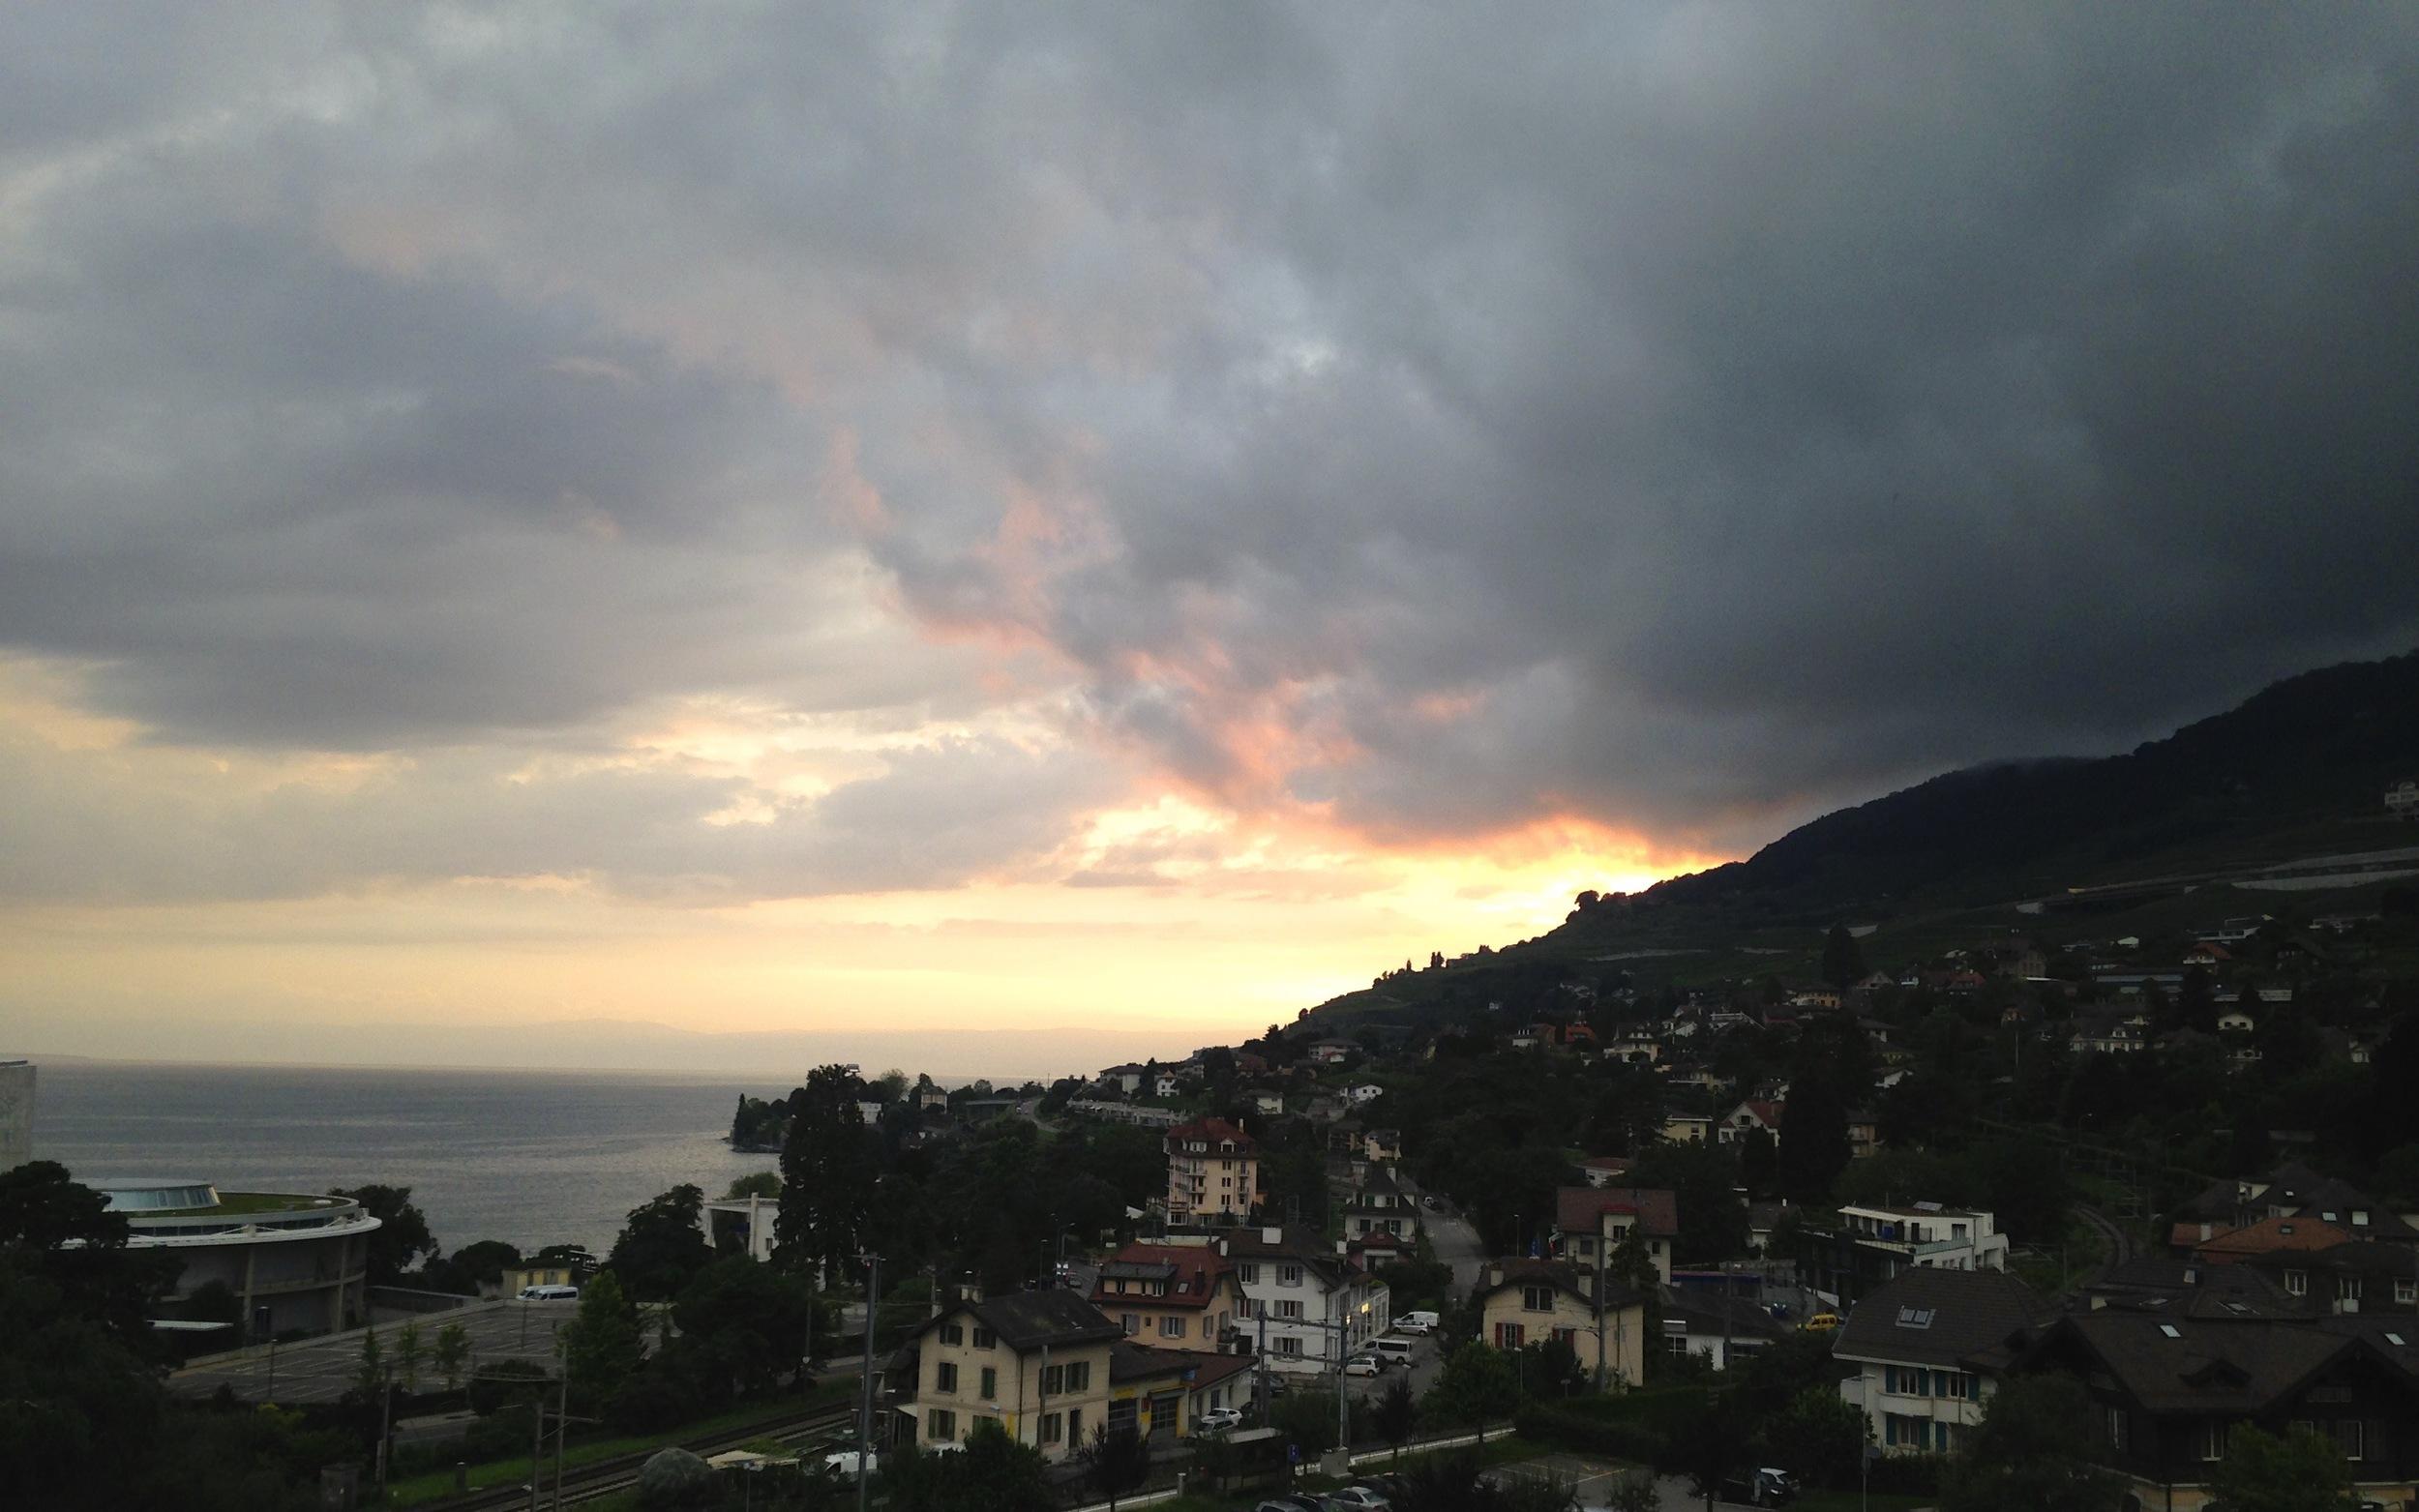 Vevey, Switzerland from the house balcony